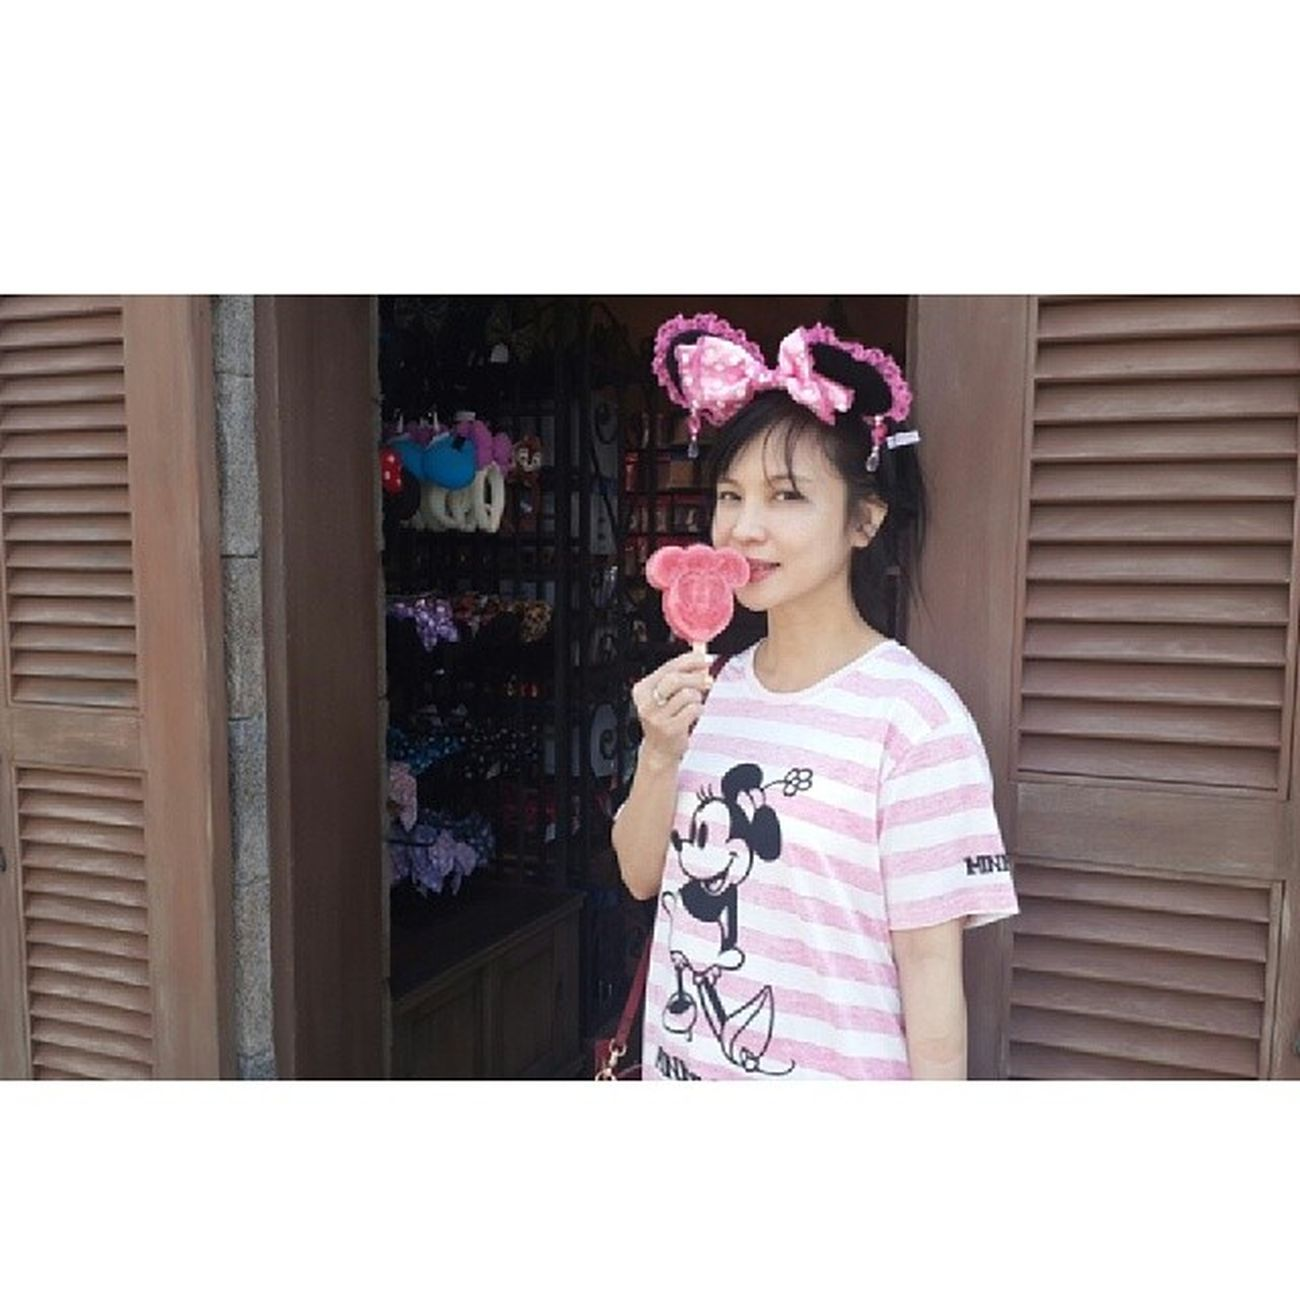 20140424 Tokyodisneysea DisneySea Disney Tokyo Japan Jp Minnie Pink fashion icecream